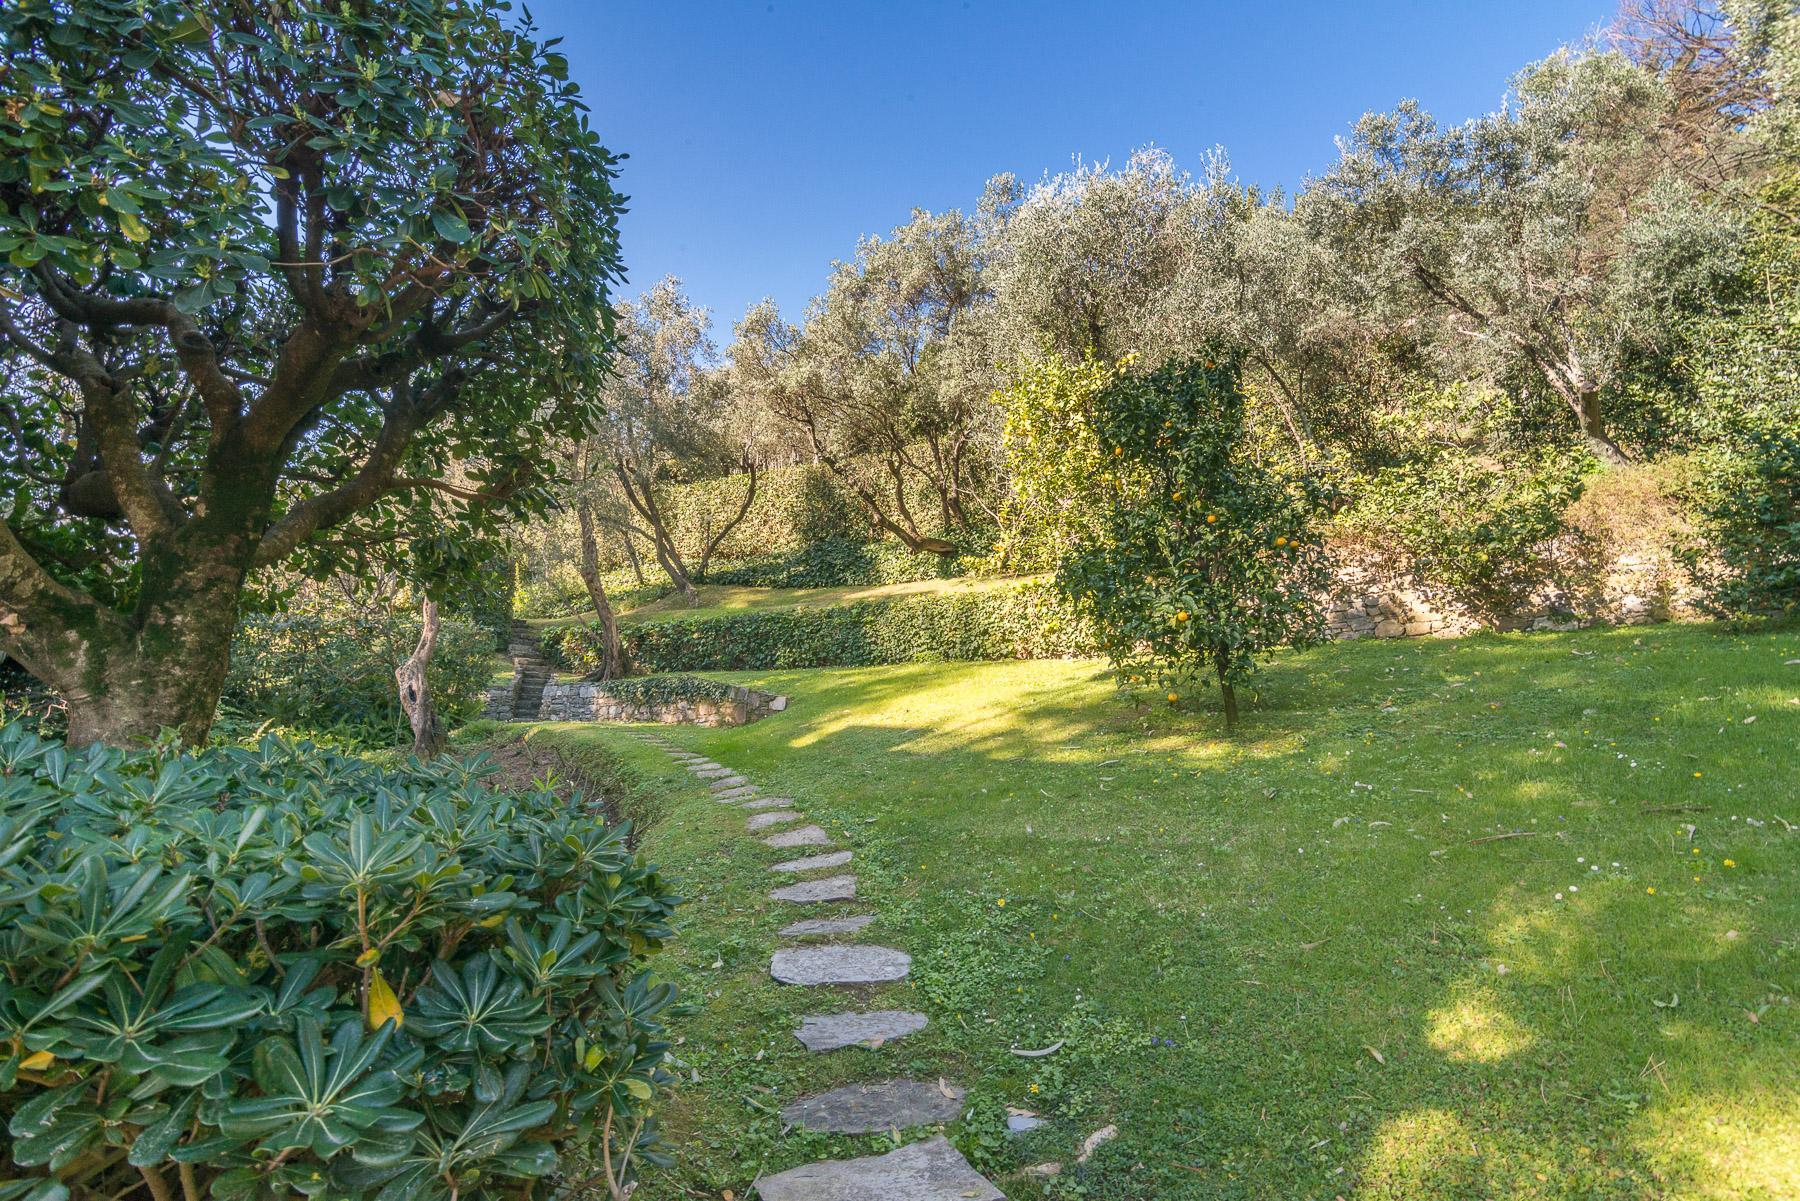 Villa in Vendita a Santa Margherita Ligure: 5 locali, 440 mq - Foto 15